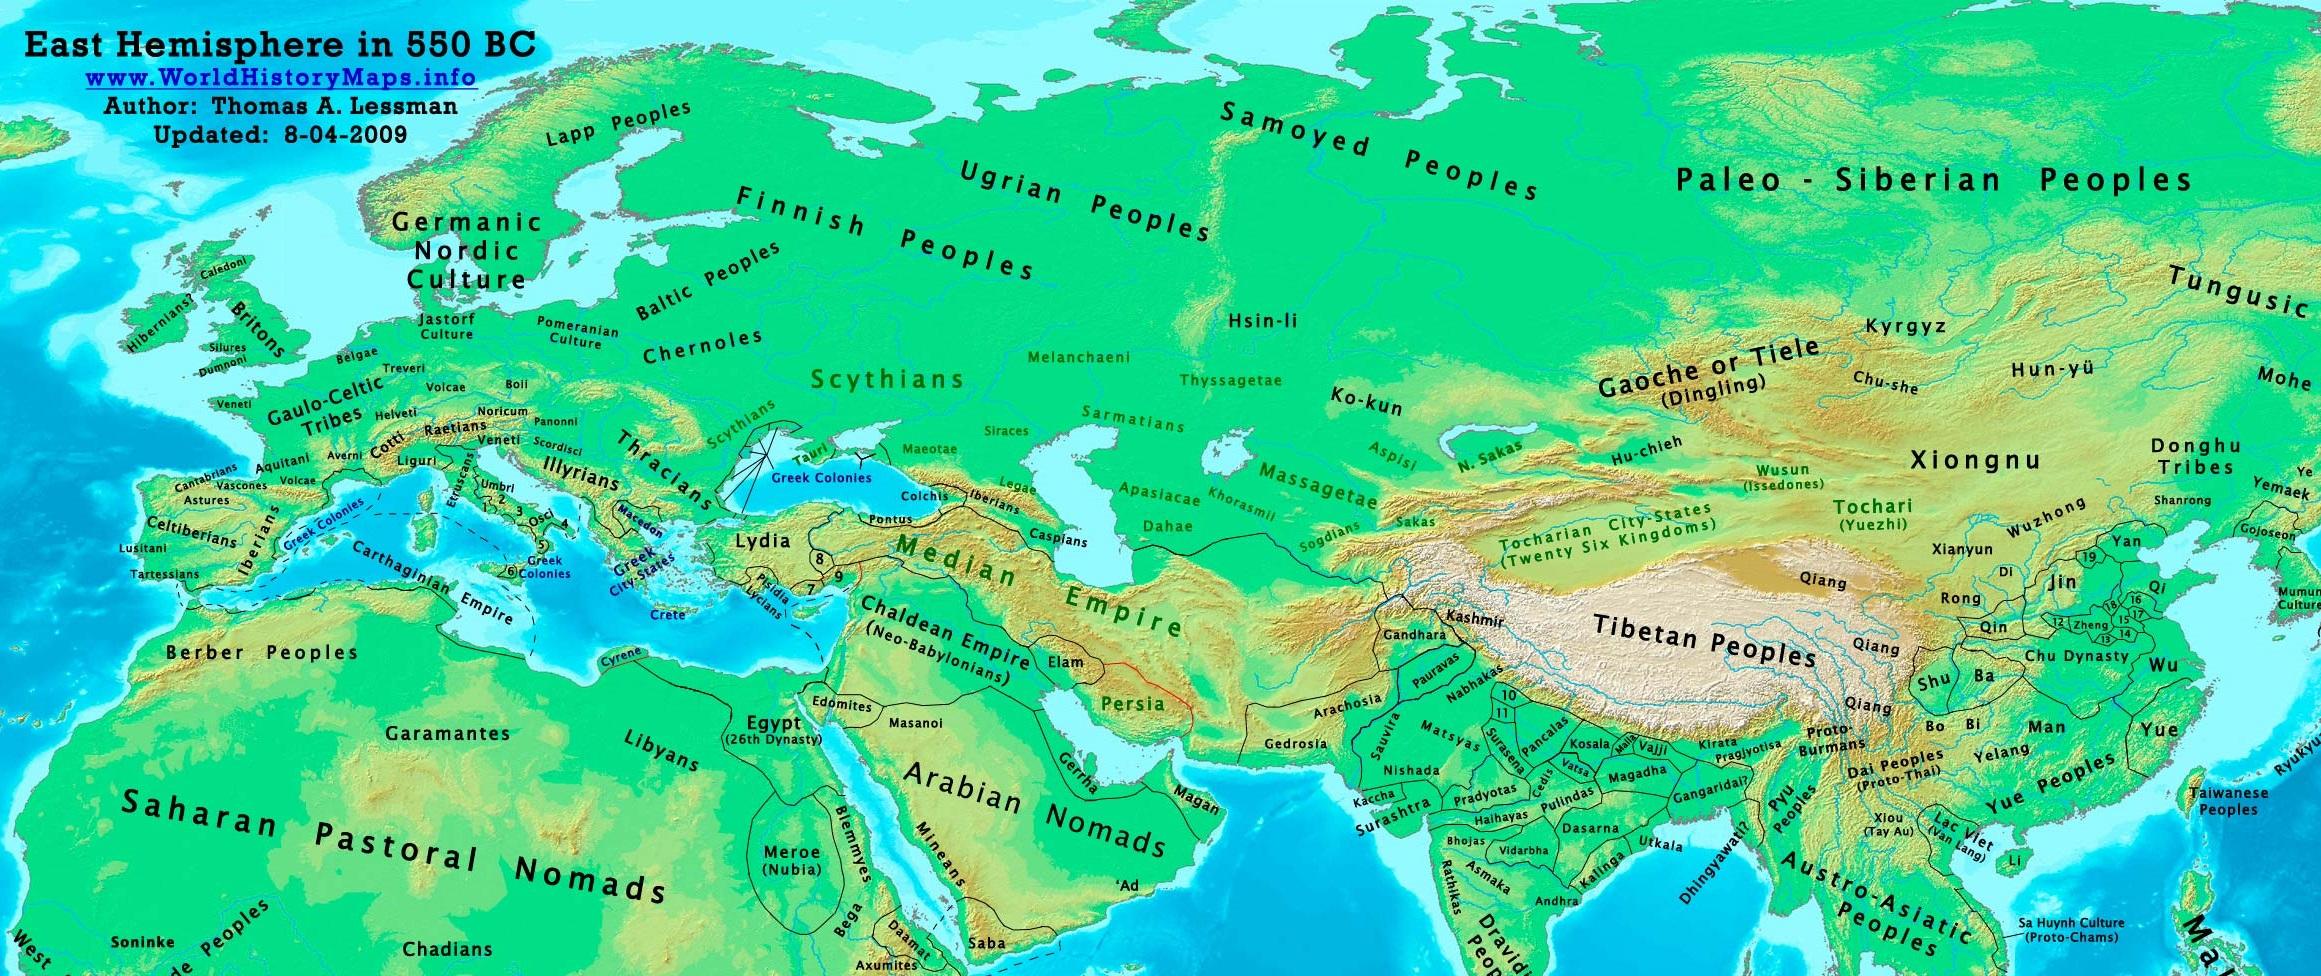 550 BC